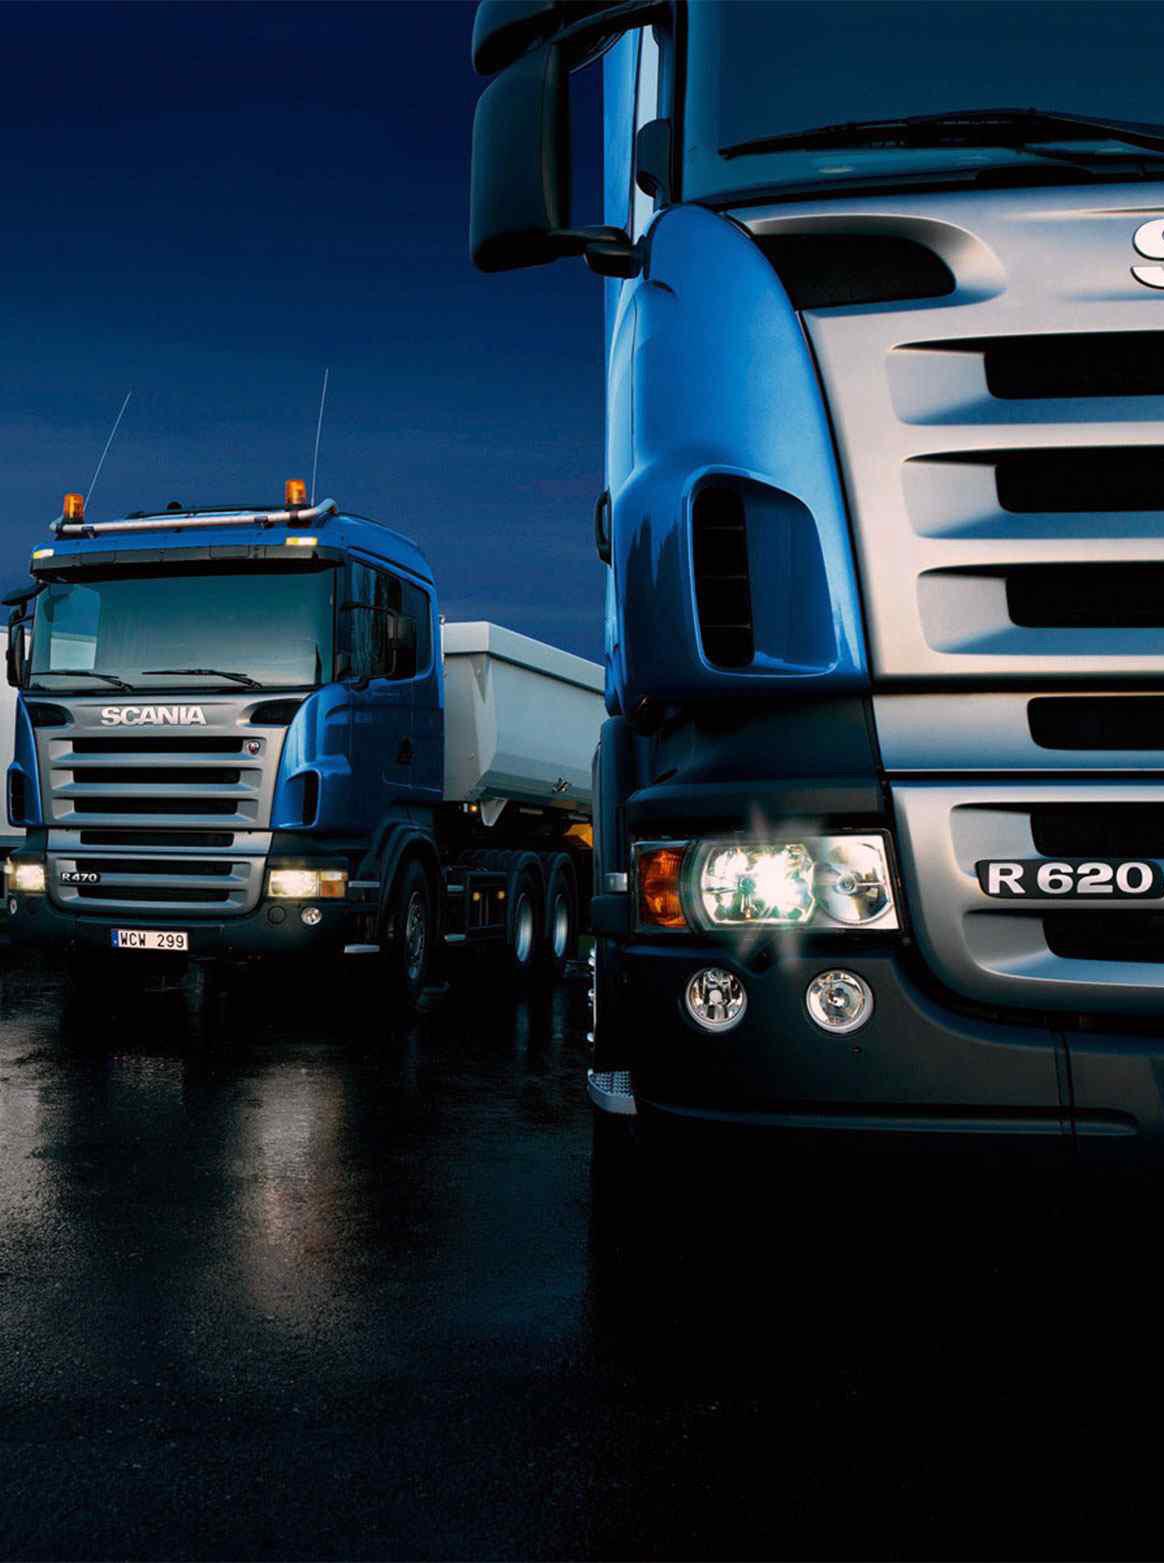 Three-trucks-on-blue-background2.jpg